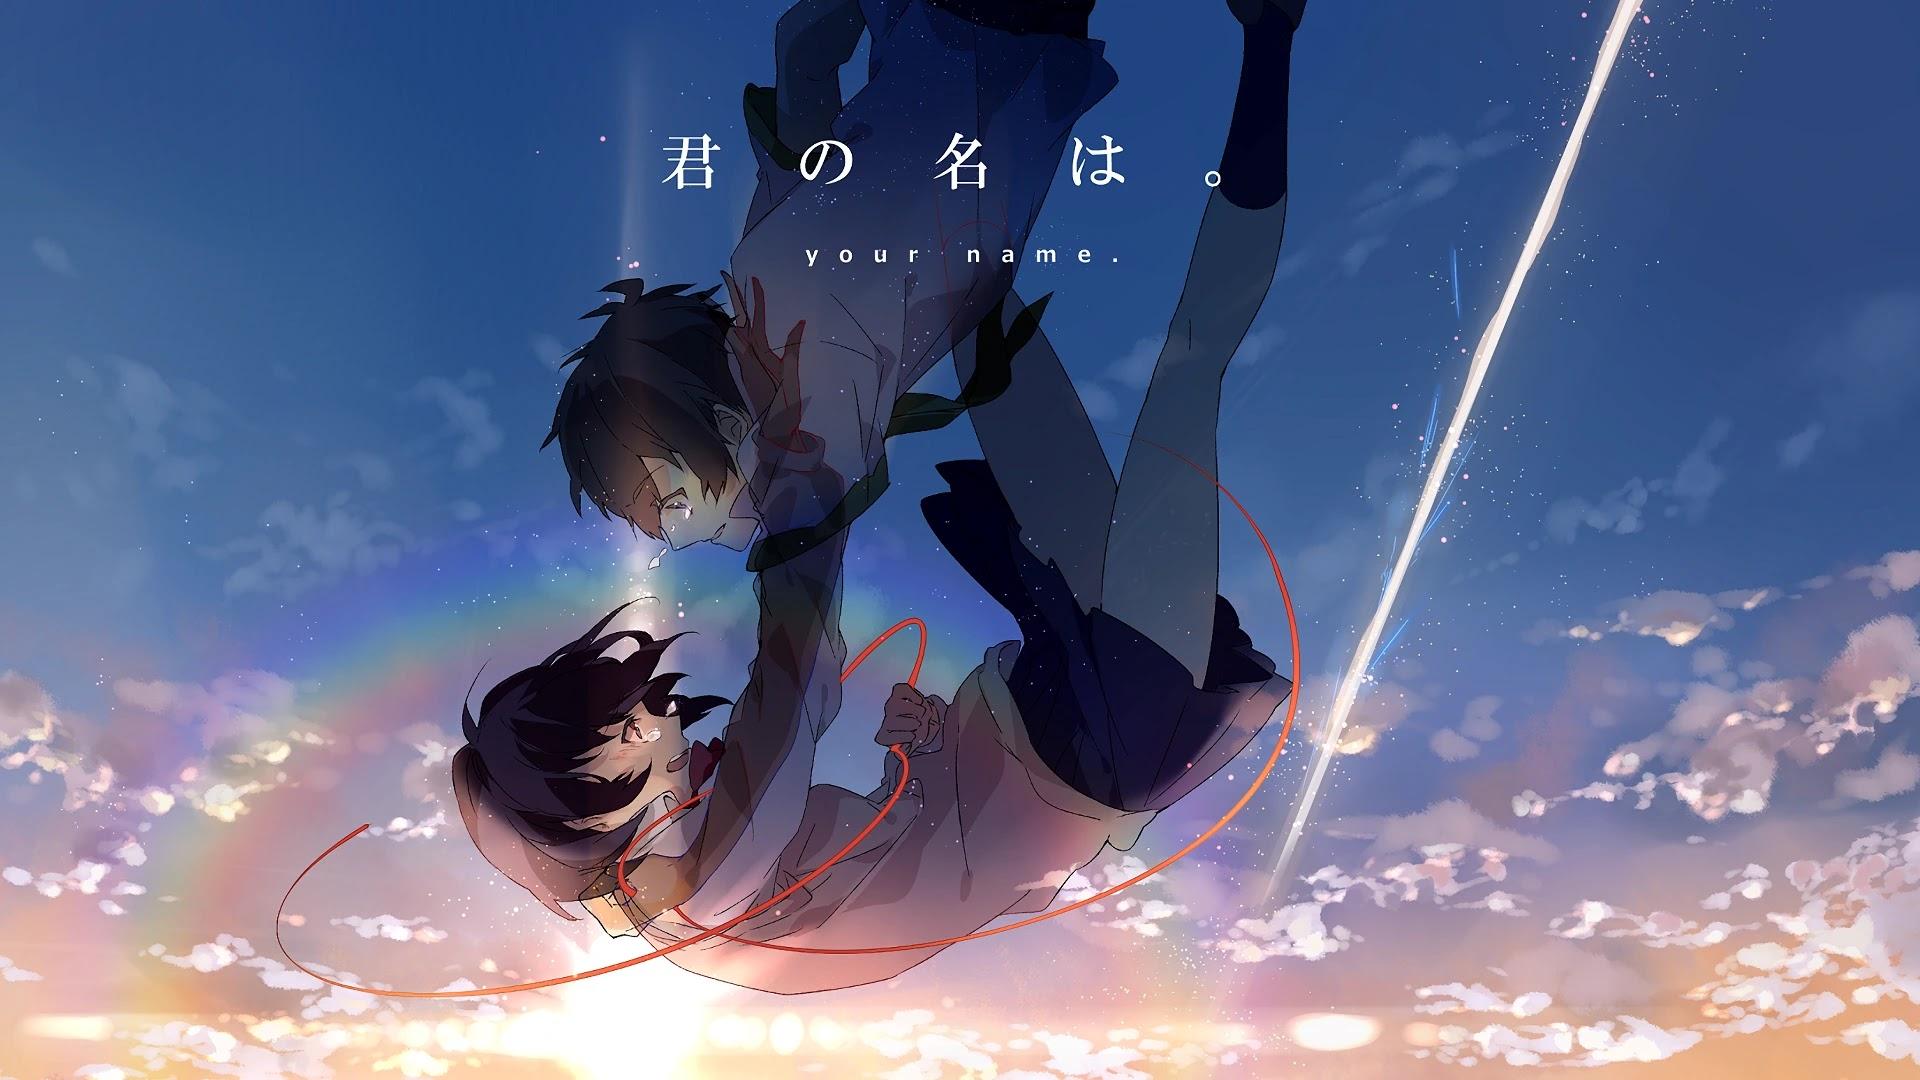 Nandemonaiya (Movie Version - Kimi No Nawa OST) - RADWIMPS